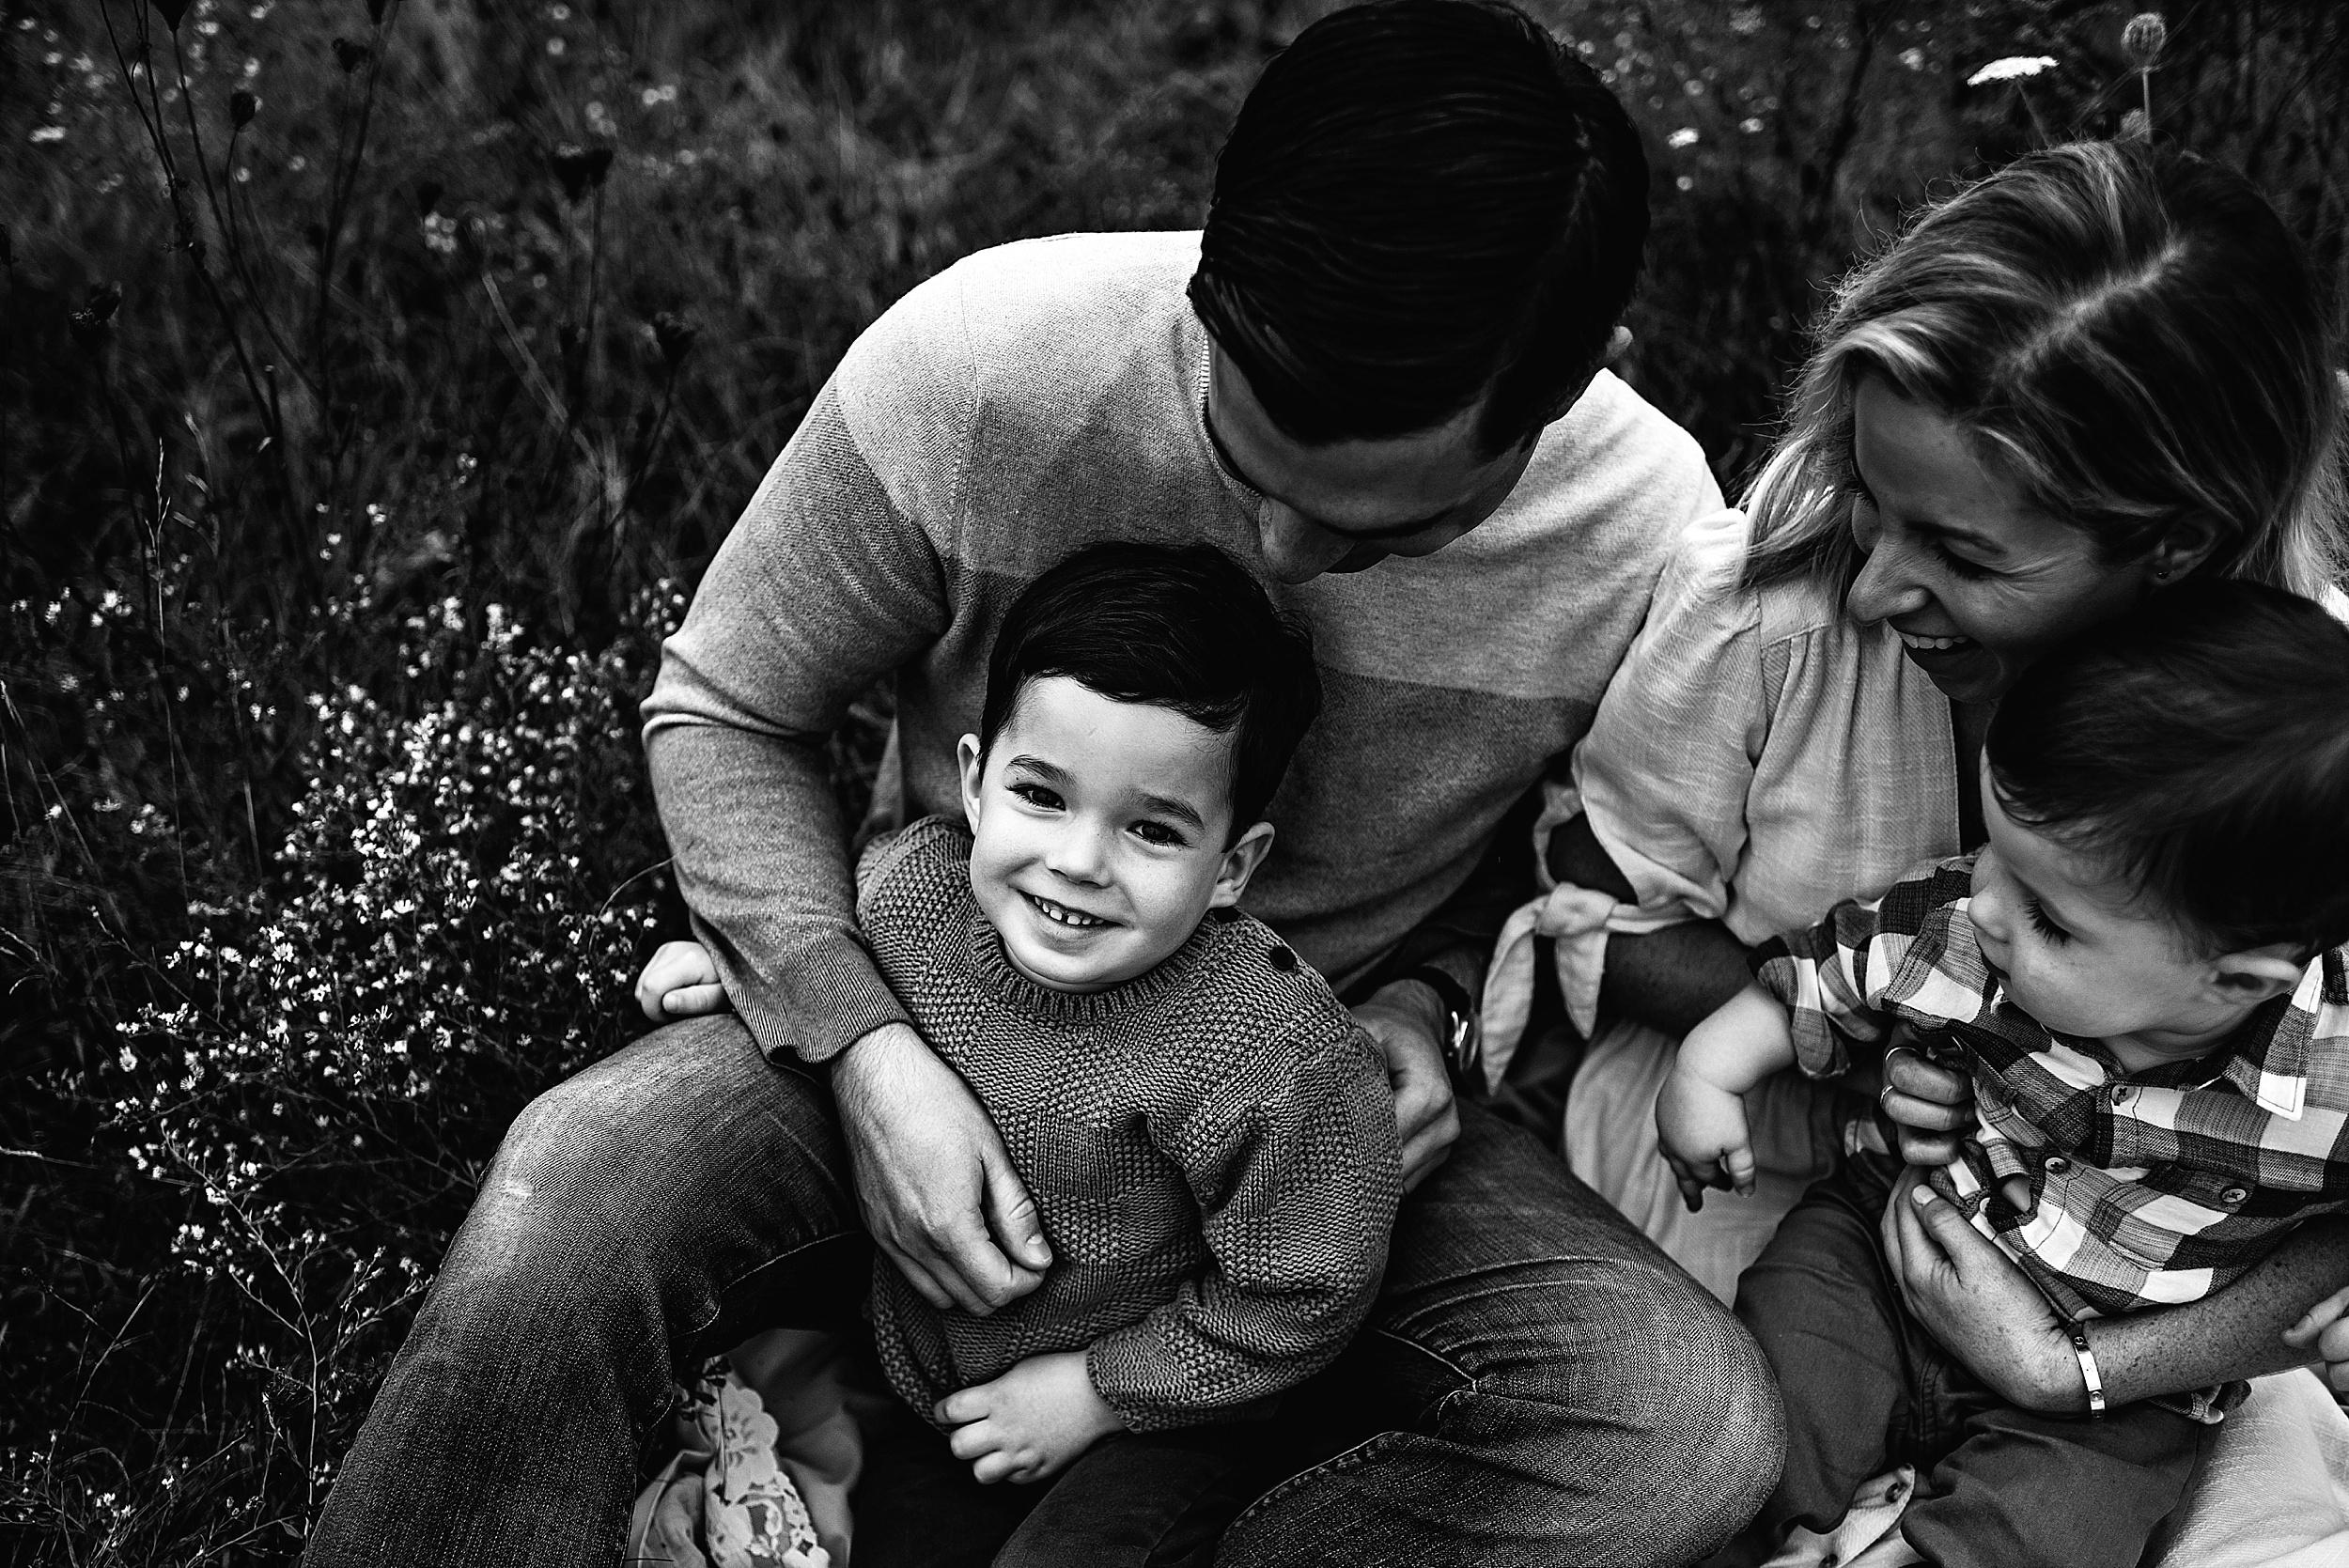 lauren-grayson-photography-portrait-artist-akron-cleveland-ohio-photographer-family-session-fields-sunset-fall_0185.jpg